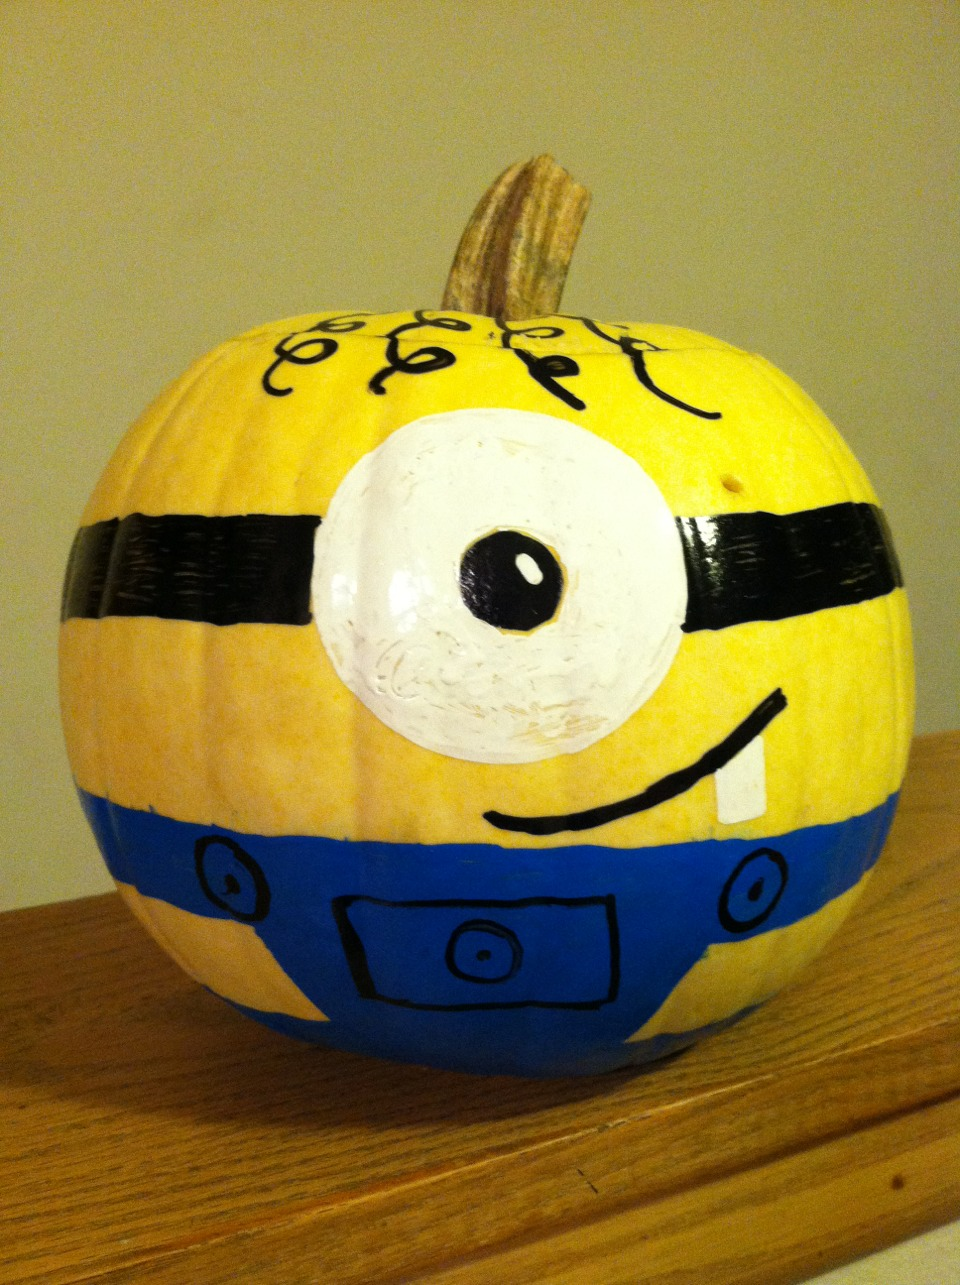 my minion pumpkin painted it with sharpie paint pens by joanne rh musely com minion pumpkin painting template easy minion pumpkin painting